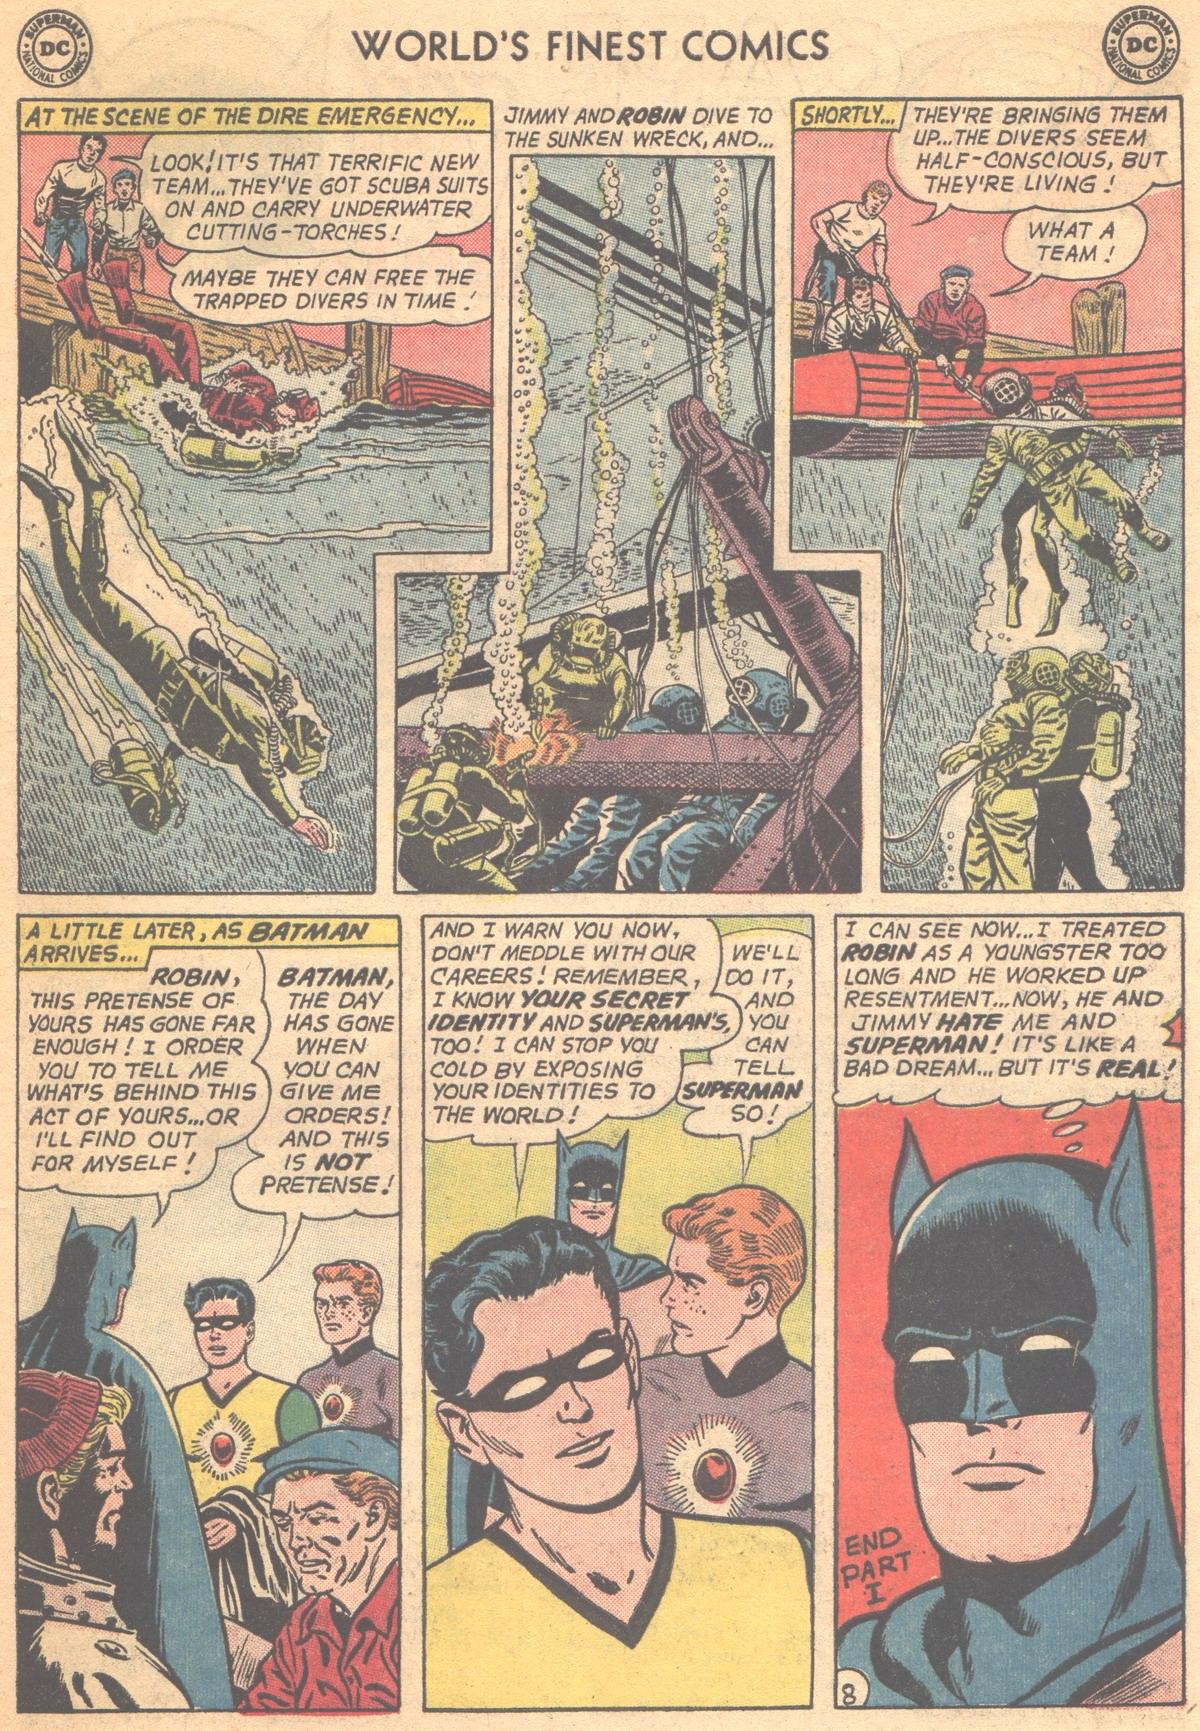 Read online World's Finest Comics comic -  Issue #147 - 11